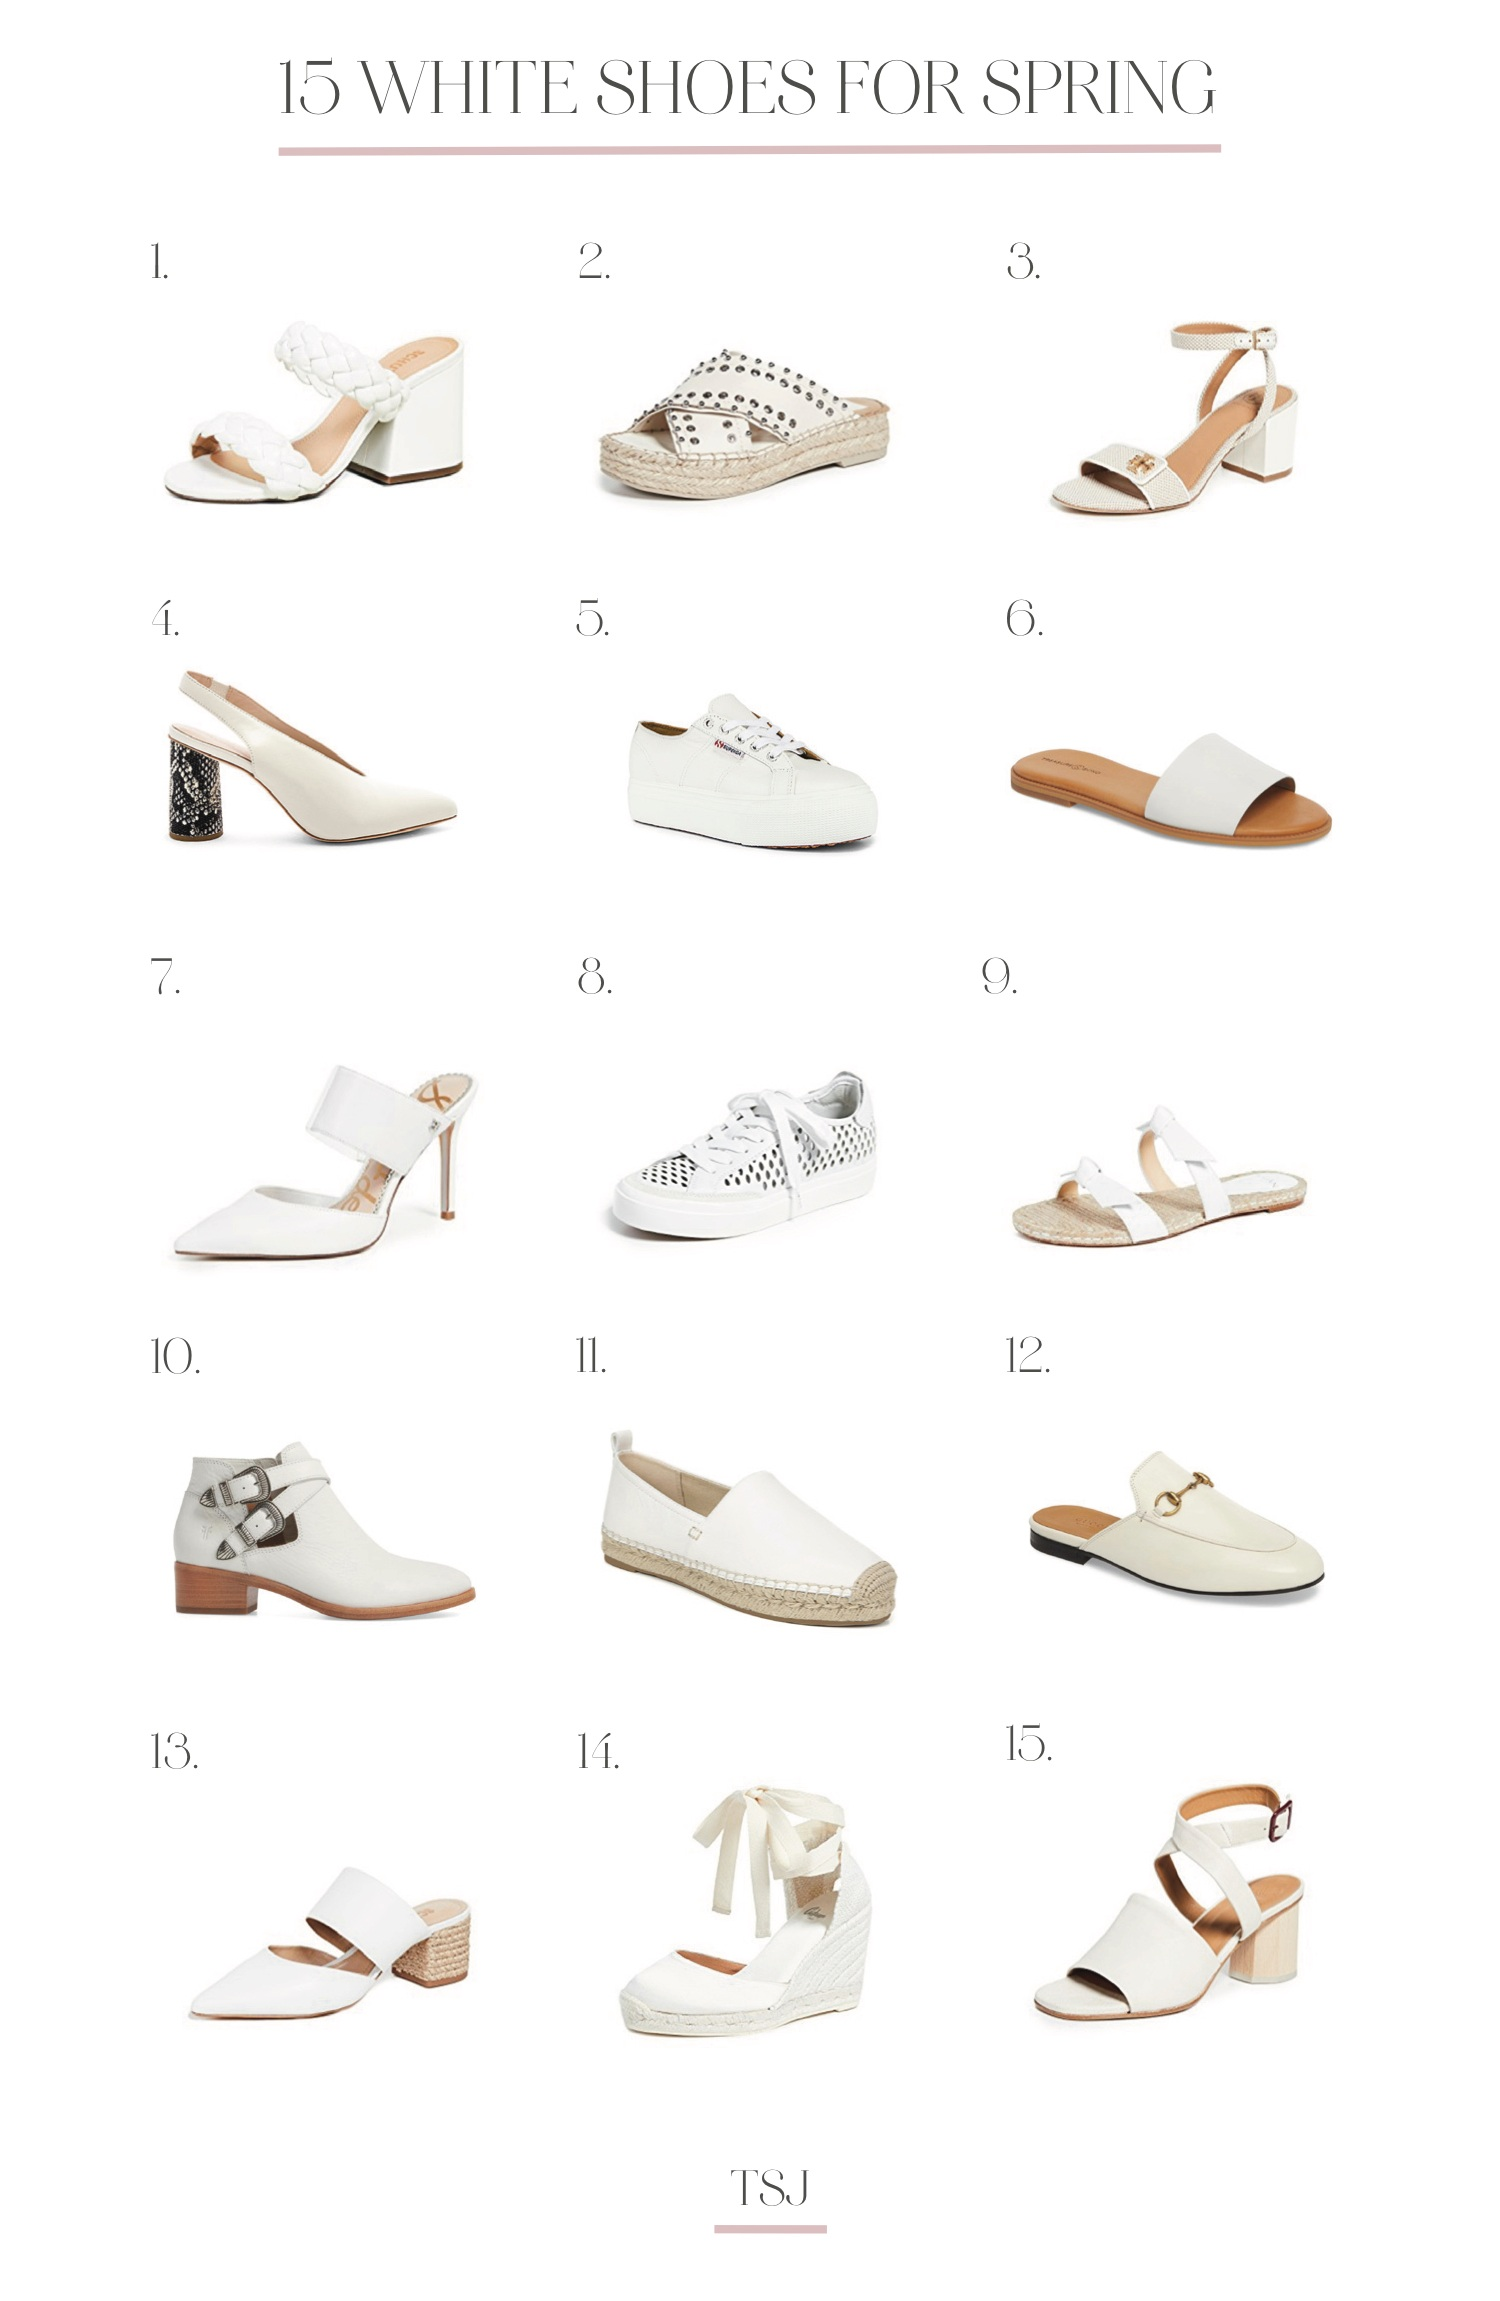 15+white+shoes+for+spring.jpg